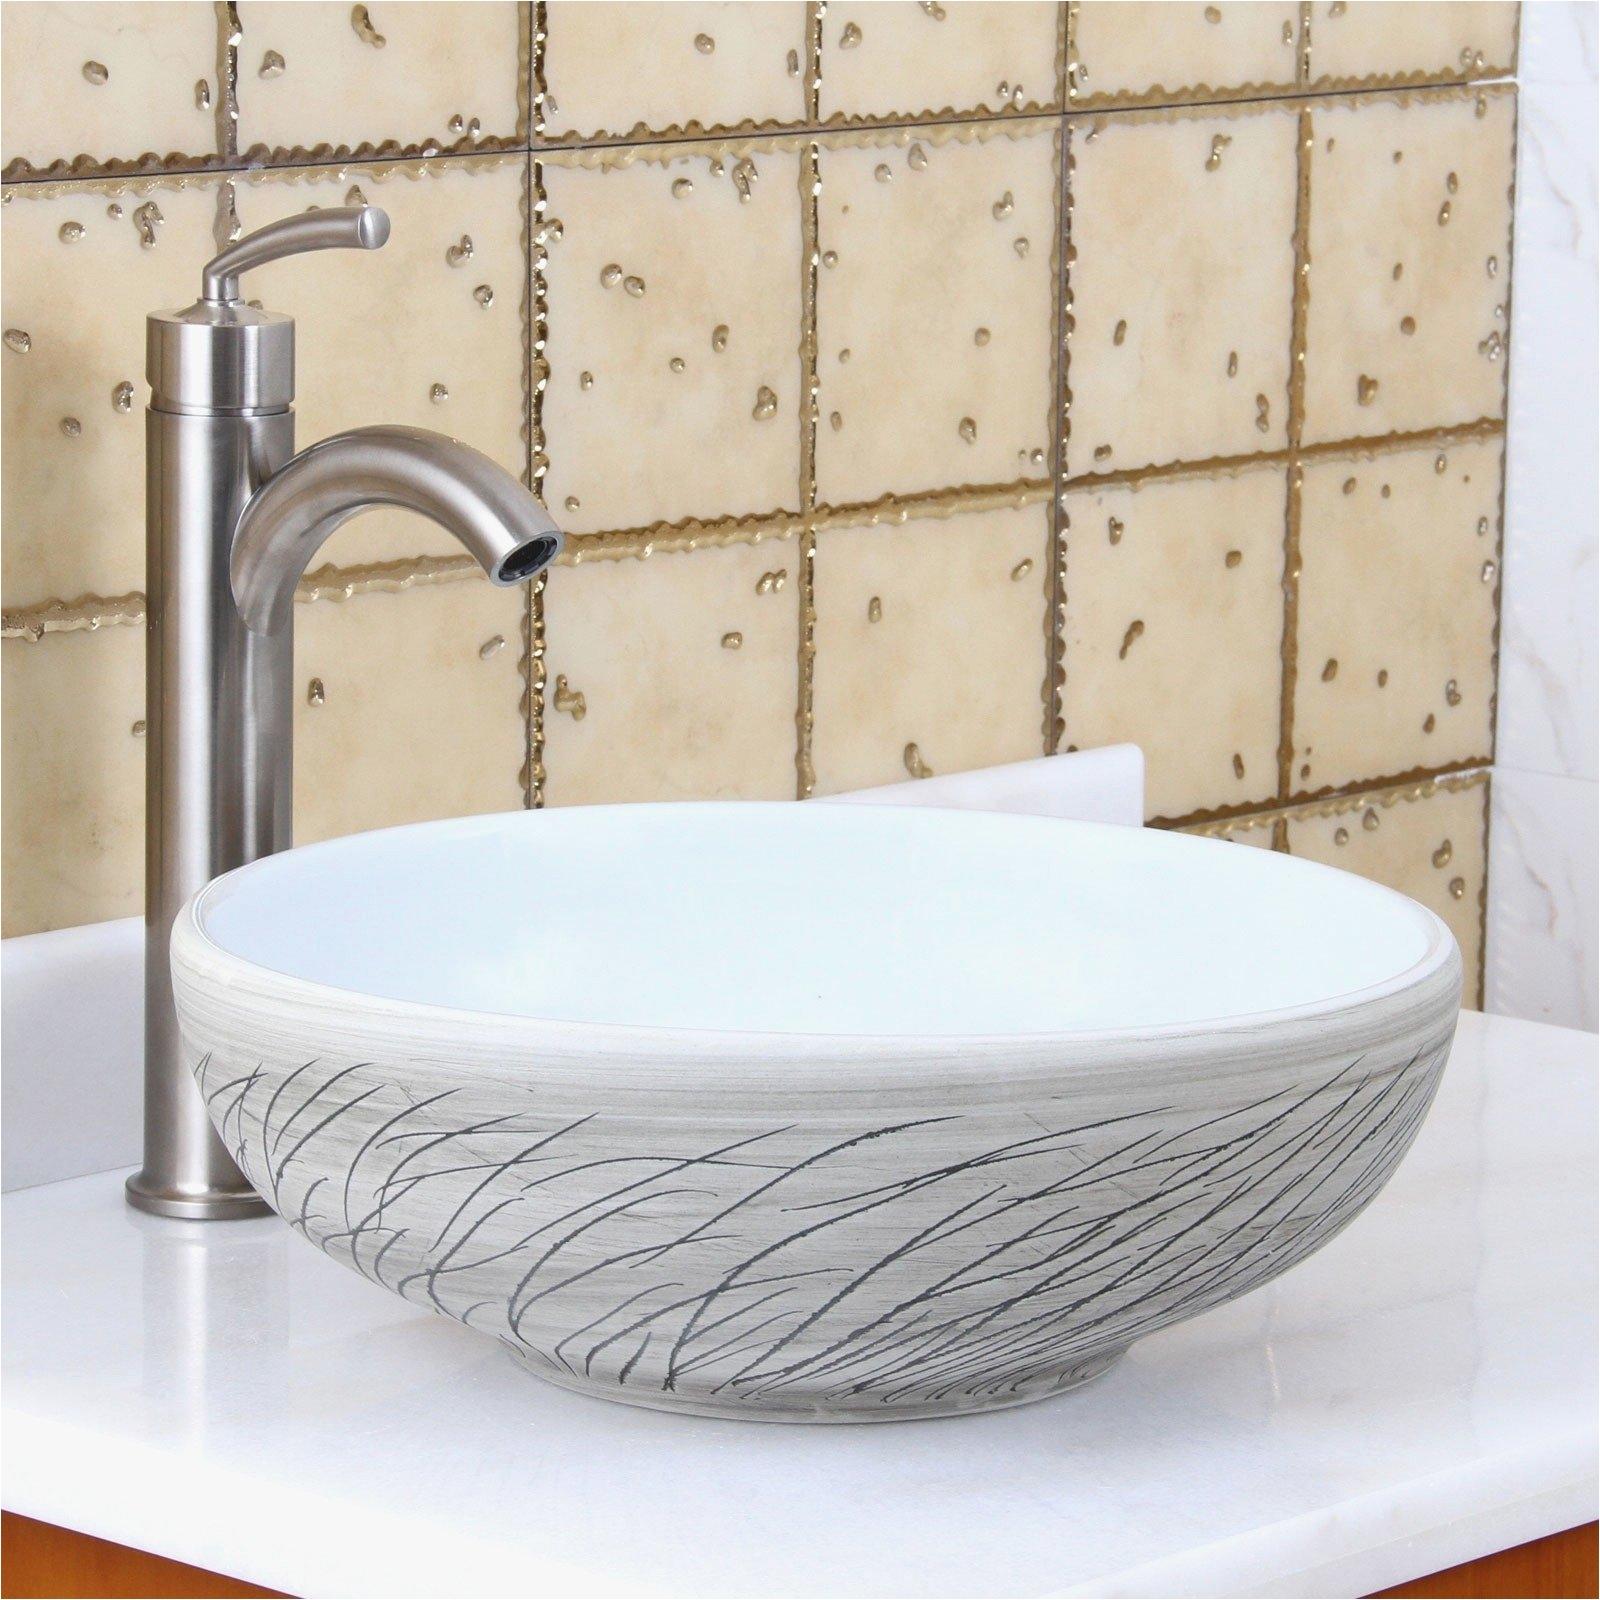 undermount bathroom sink installation beautiful luxury bathroom shower light new h sink install bathroom i 0d